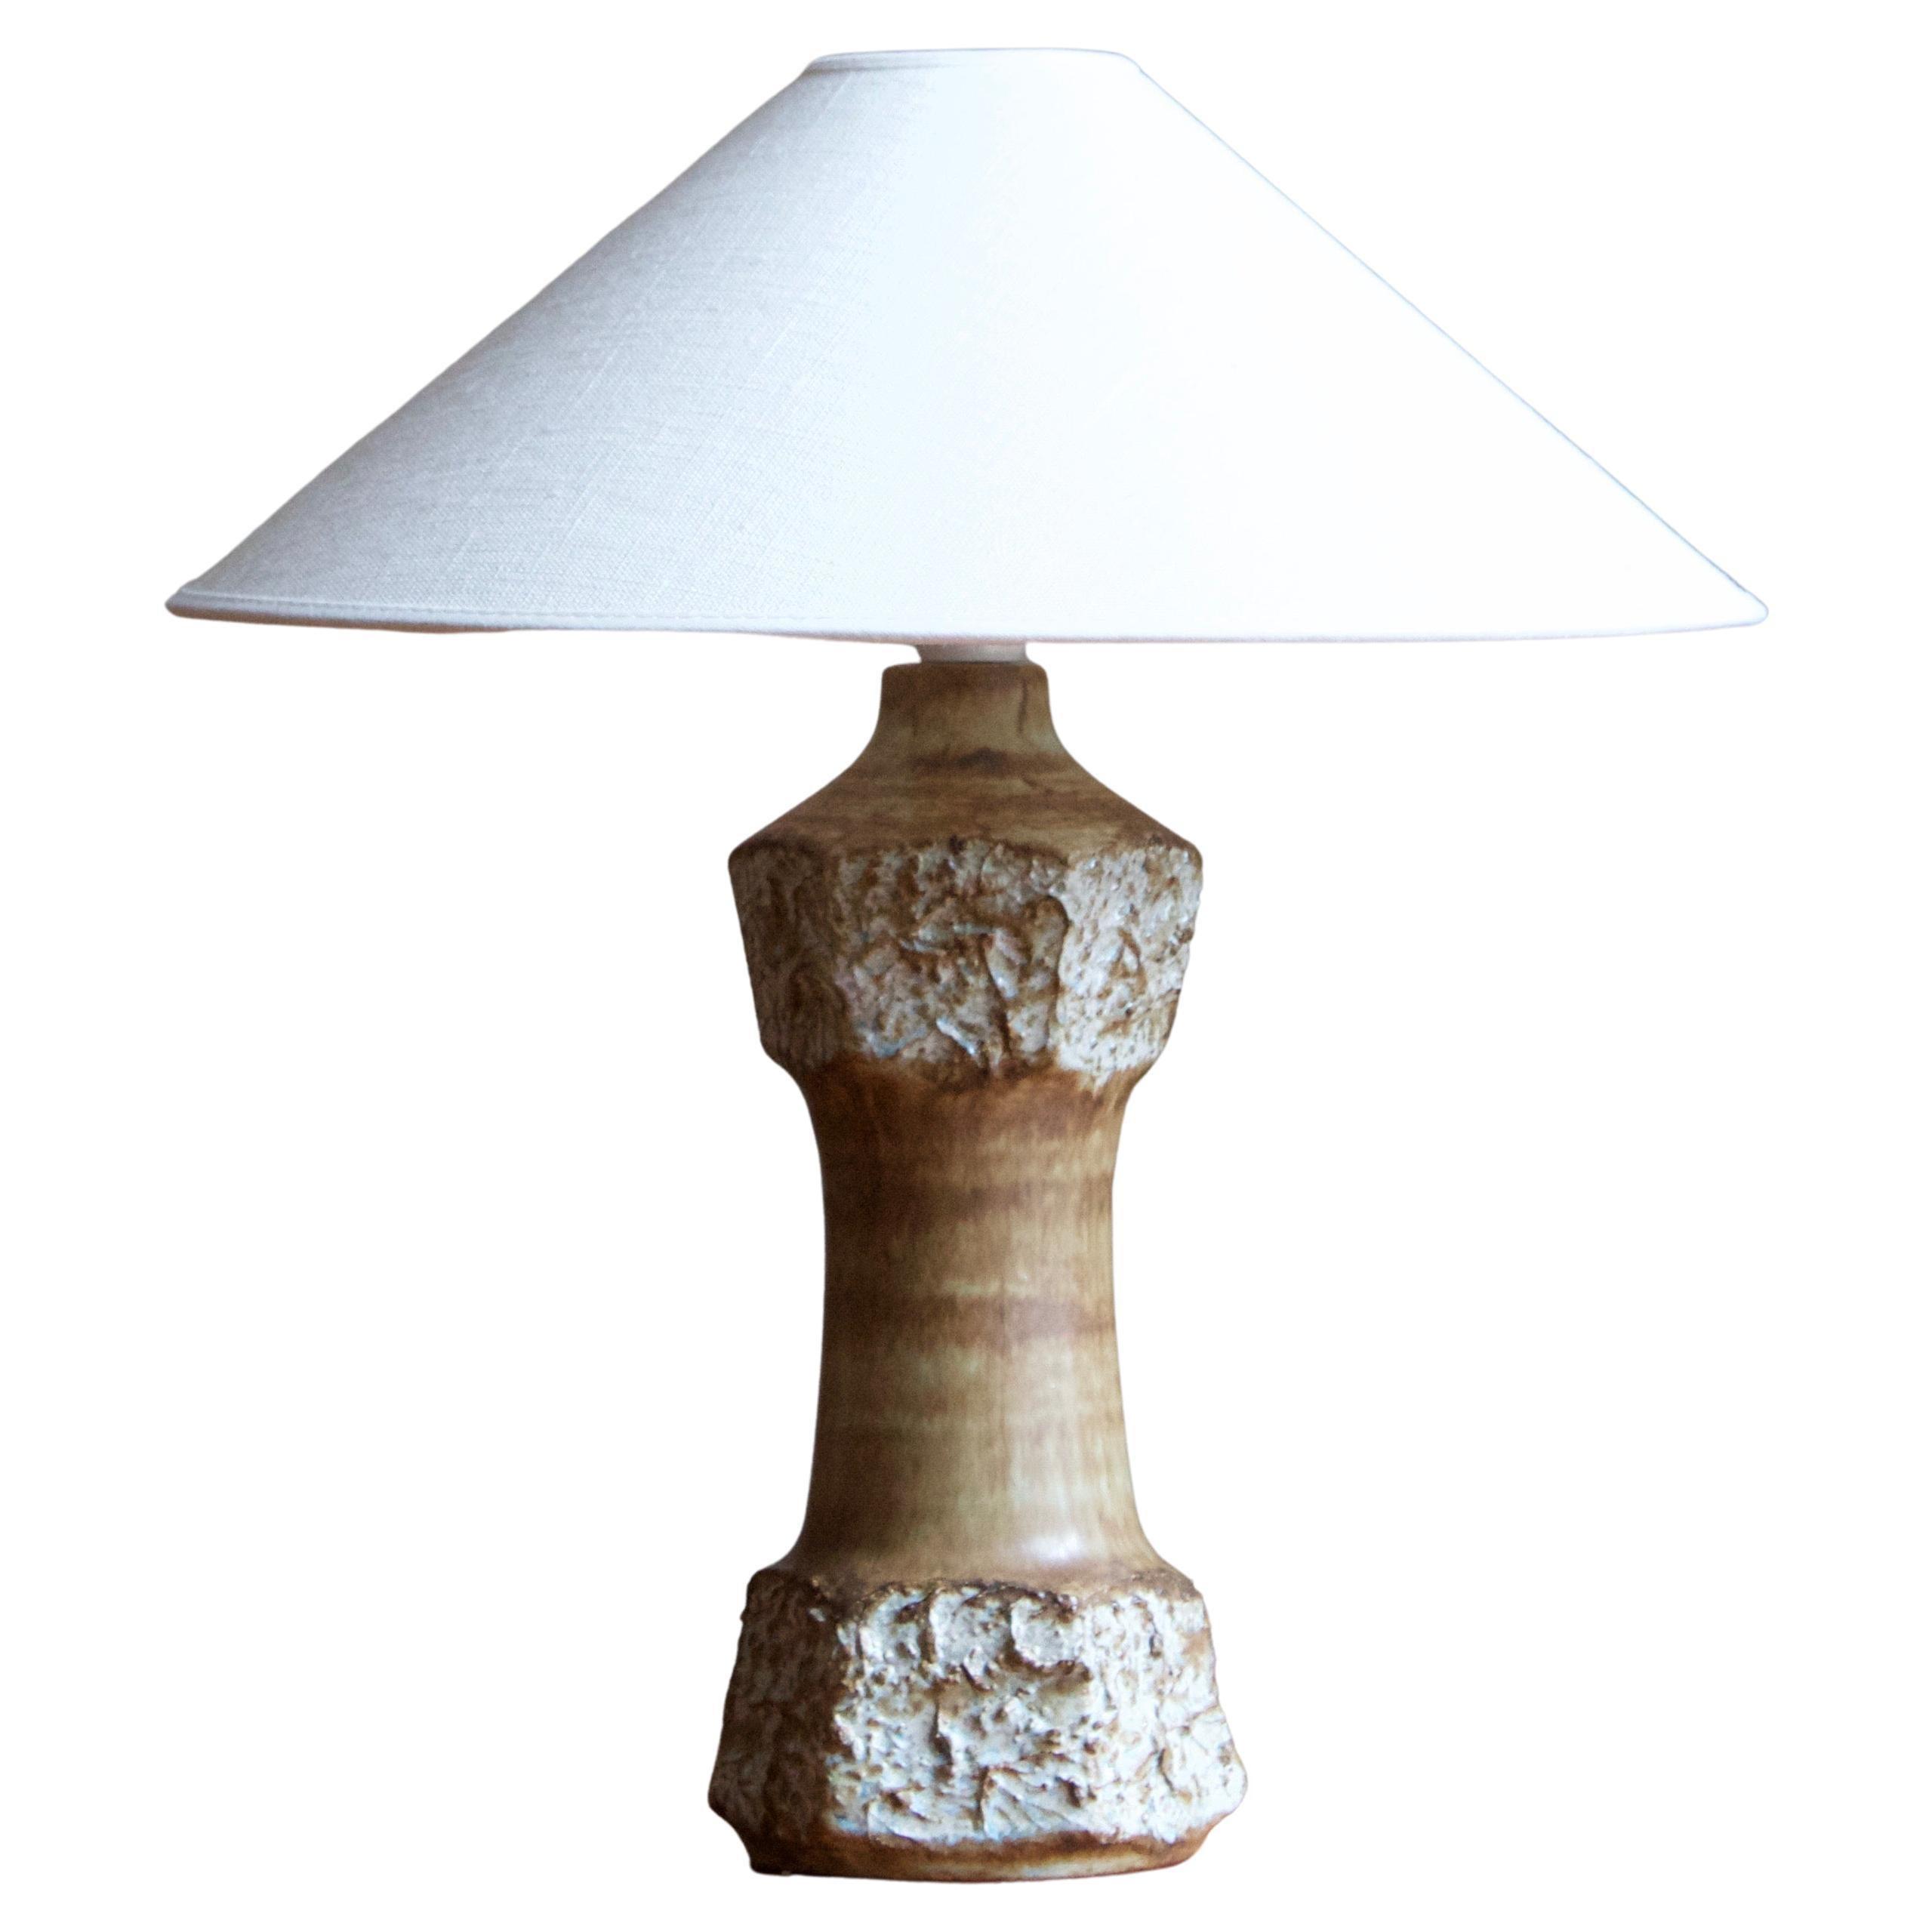 Bruno Karlsson, Table Lamp, Stoneware, Studio Ego, Sweden, 1960s